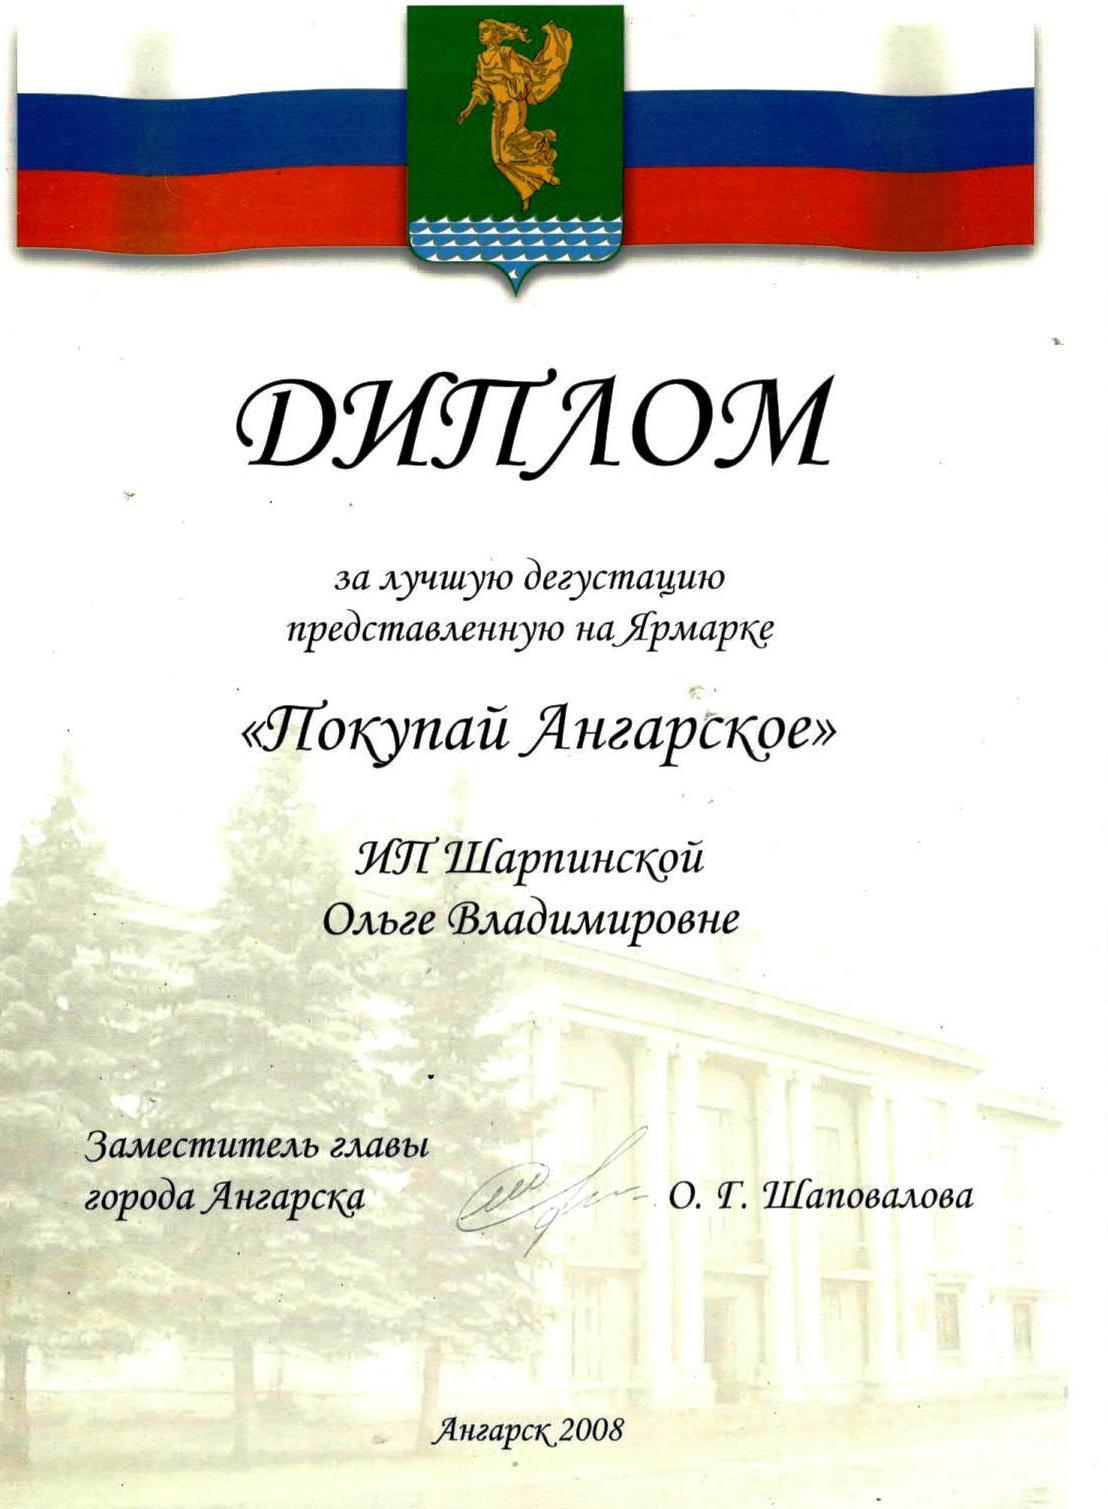 Транспортные документы 1